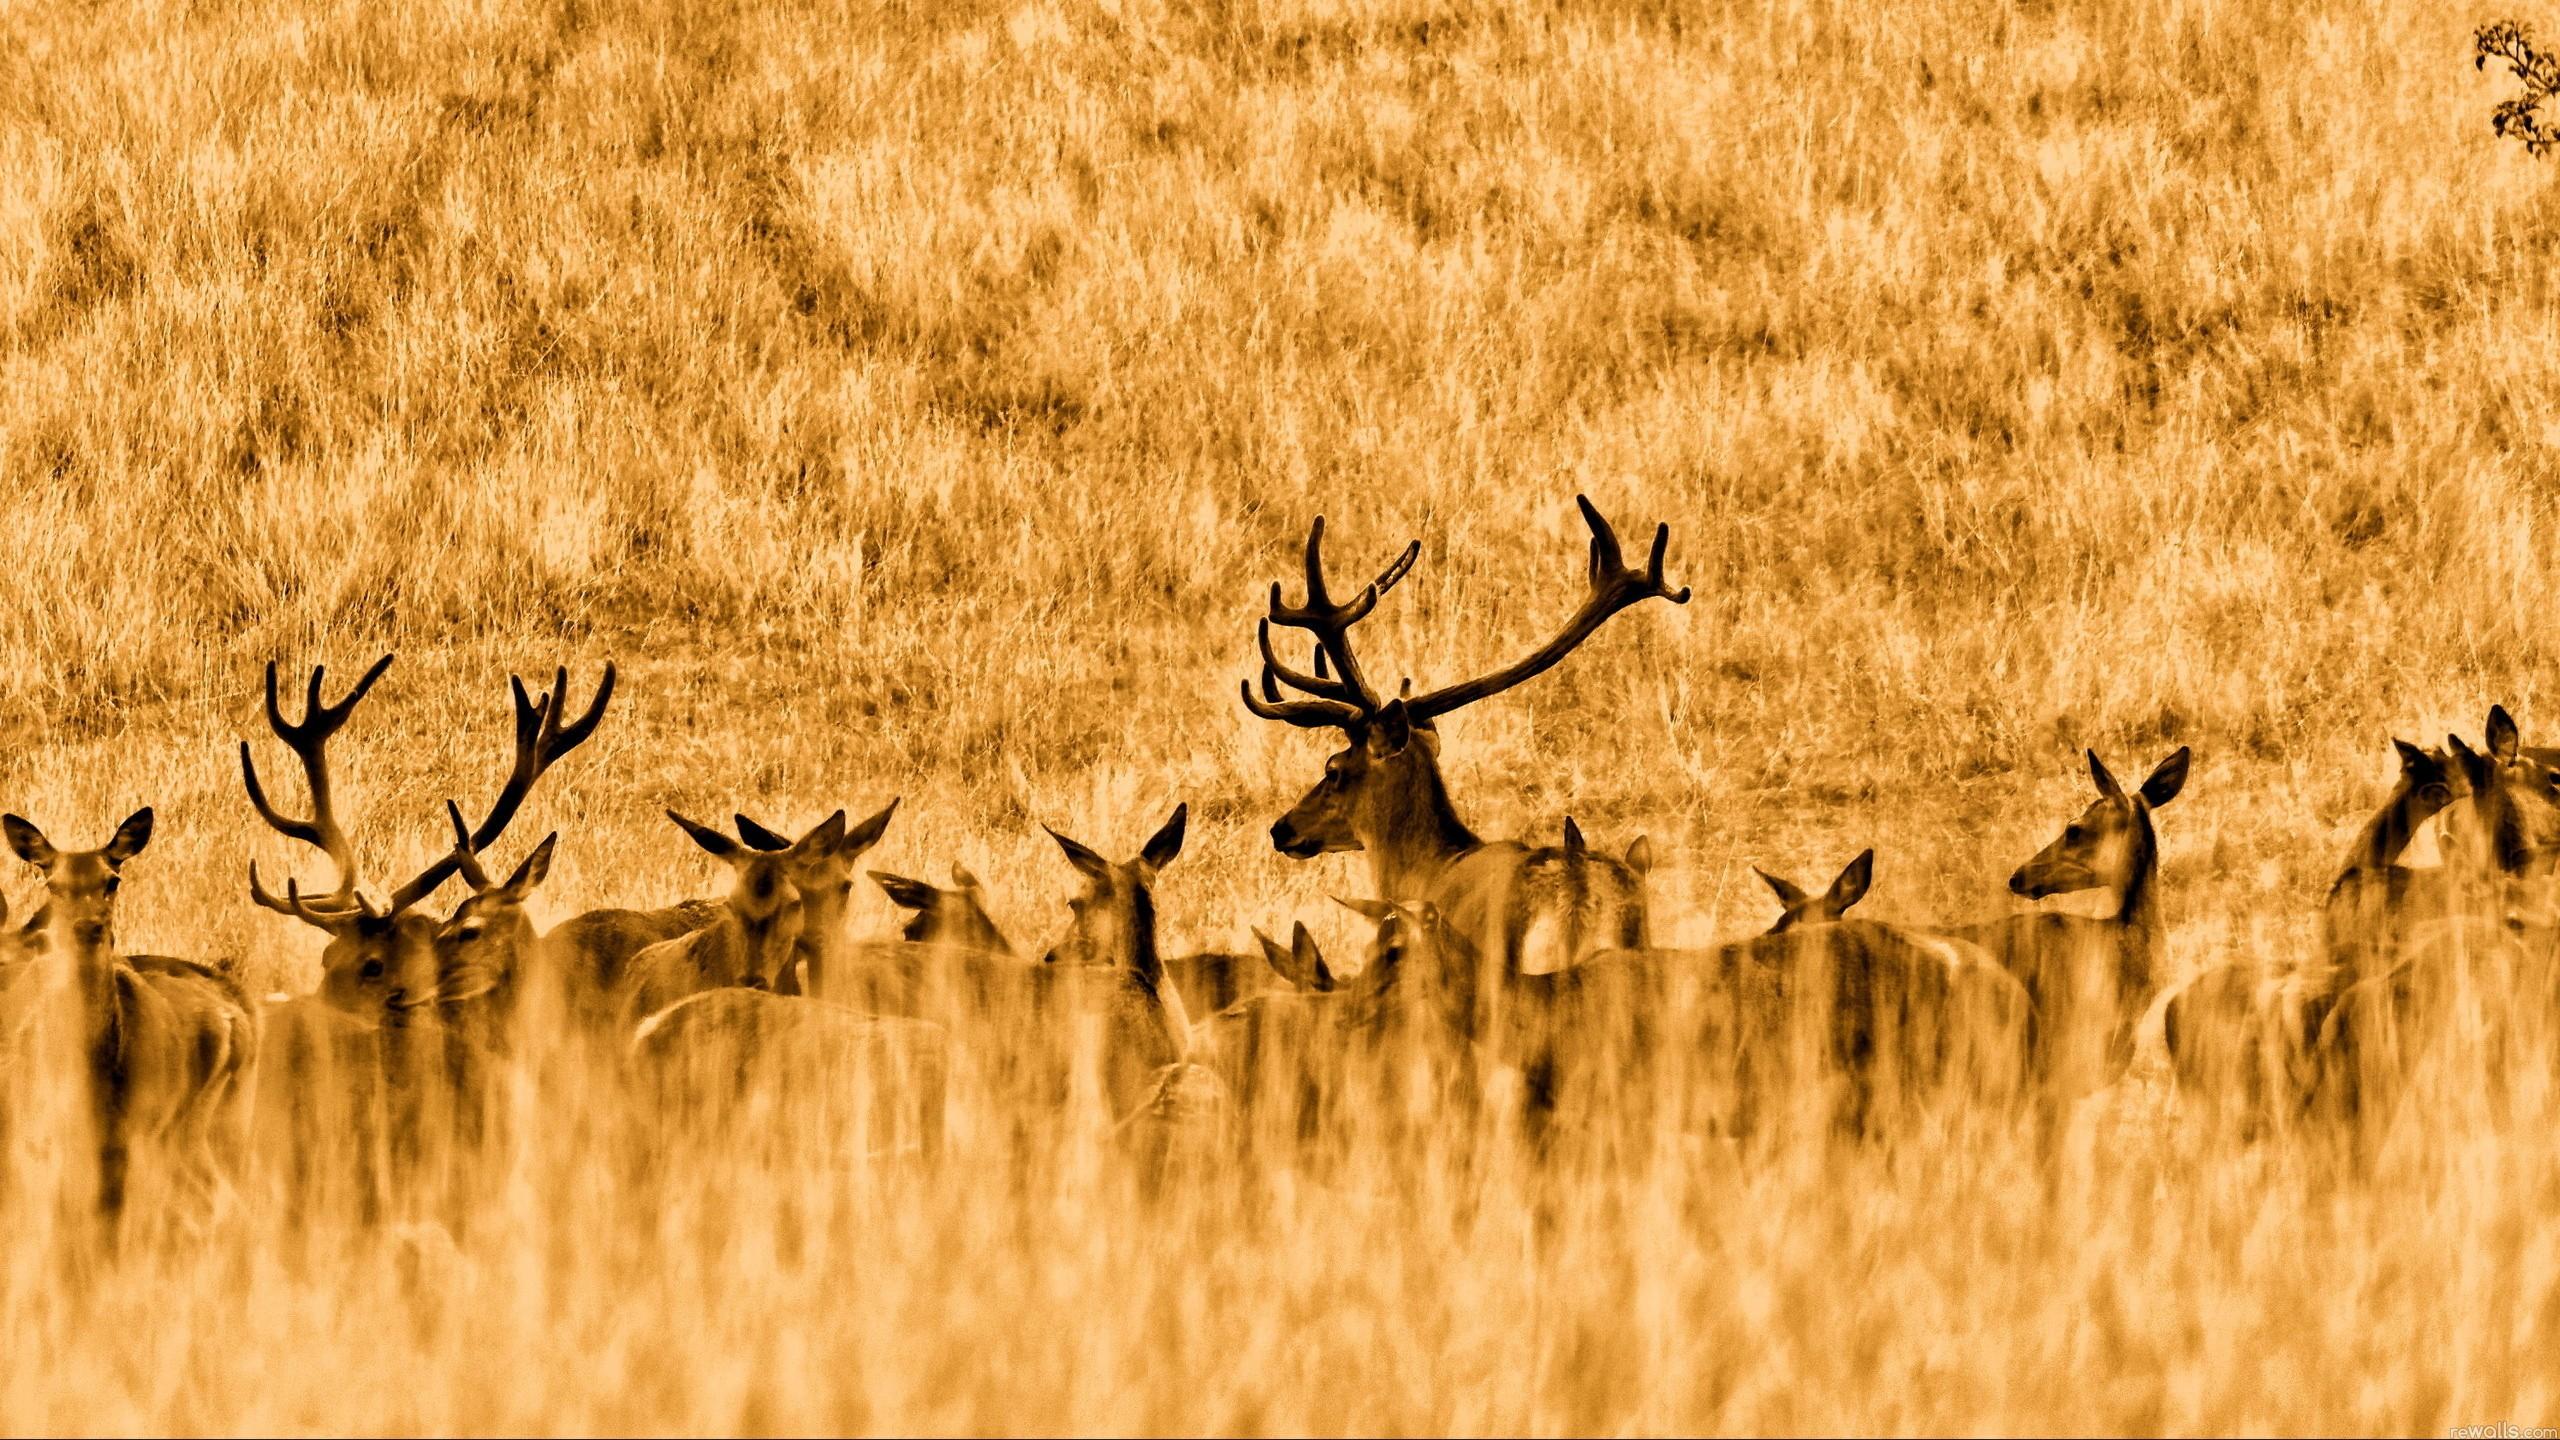 8k Animal Wallpaper Download: Wildlife Wallpapers, Photos And Desktop Backgrounds Up To